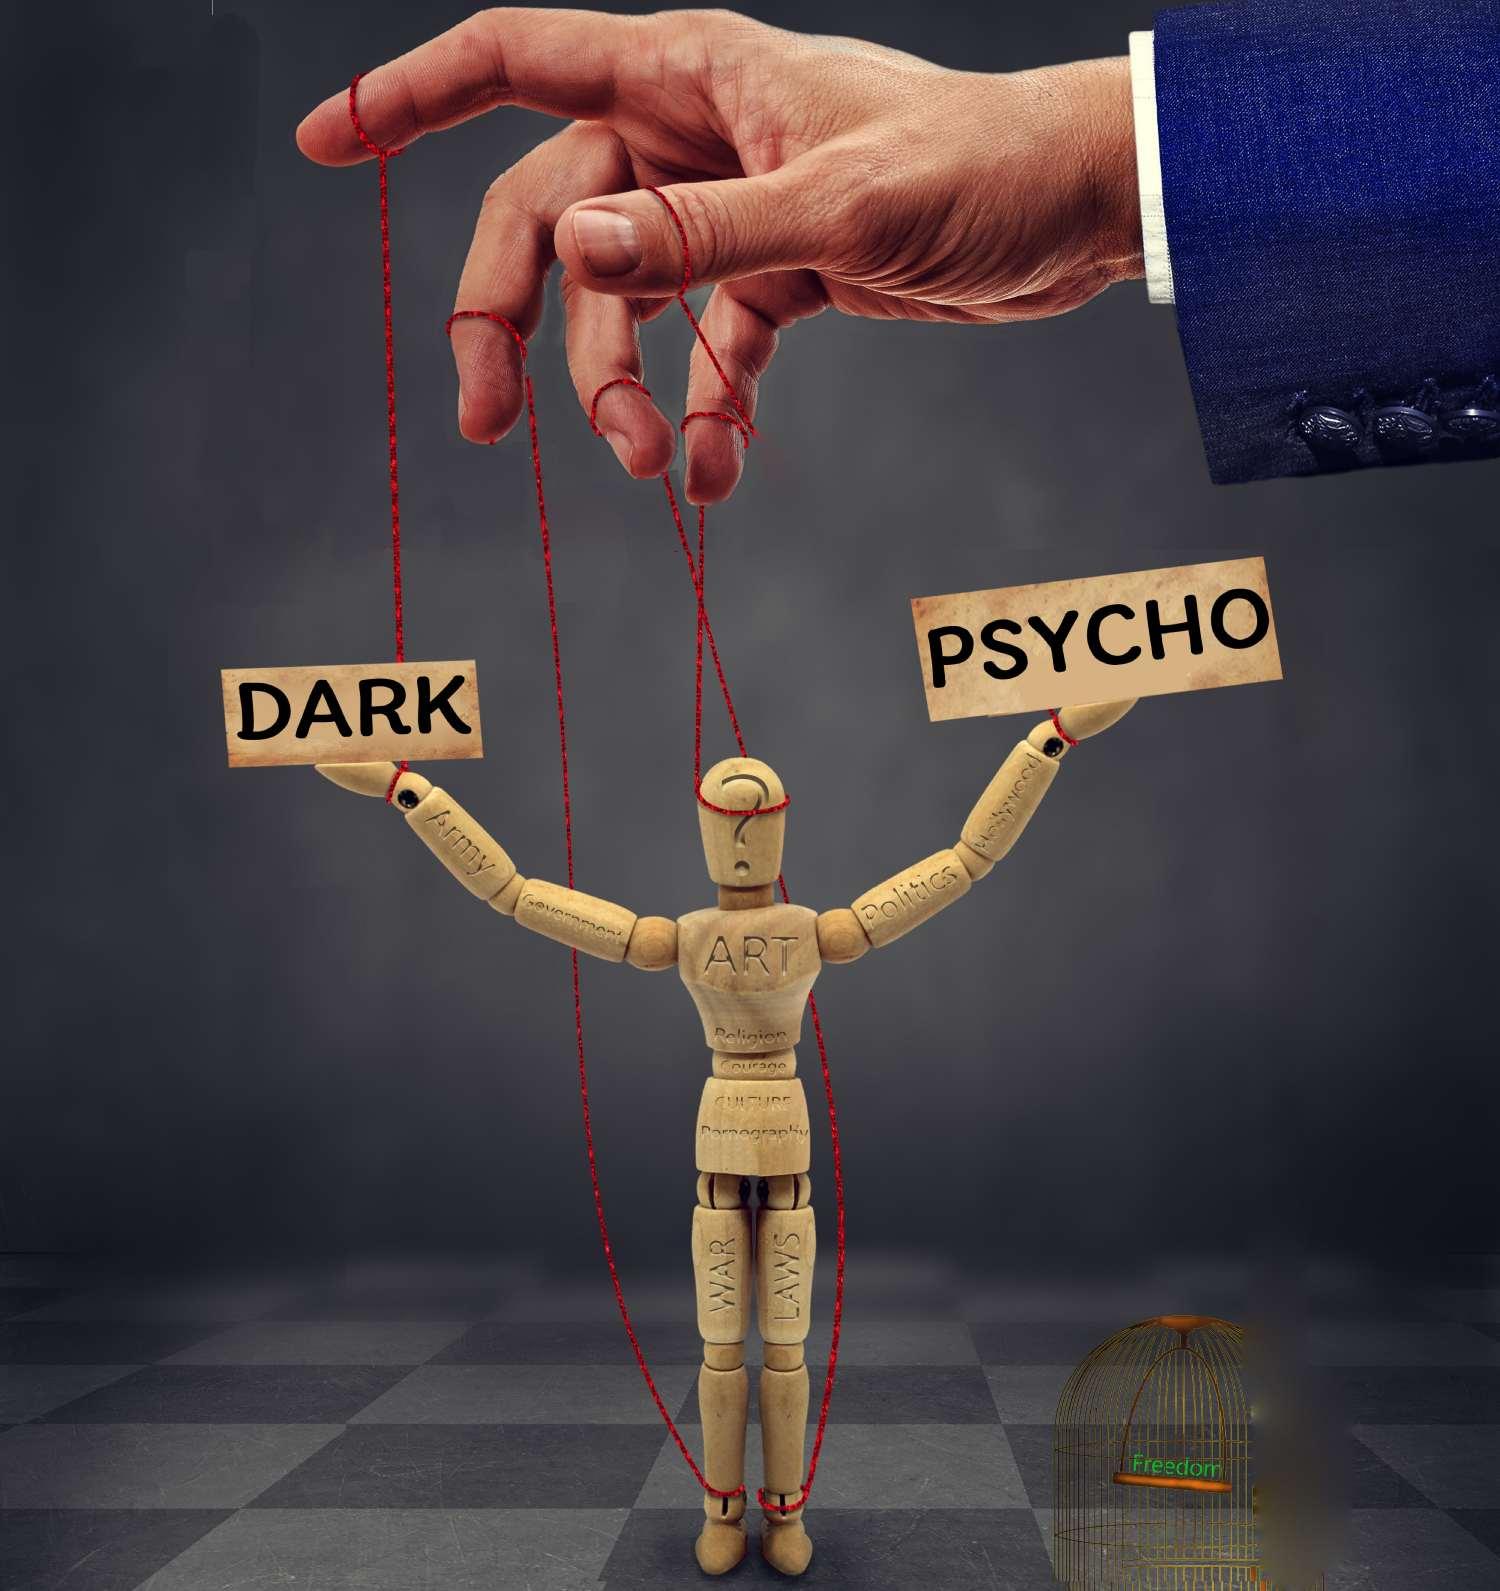 muppetter holding dark psychology cards